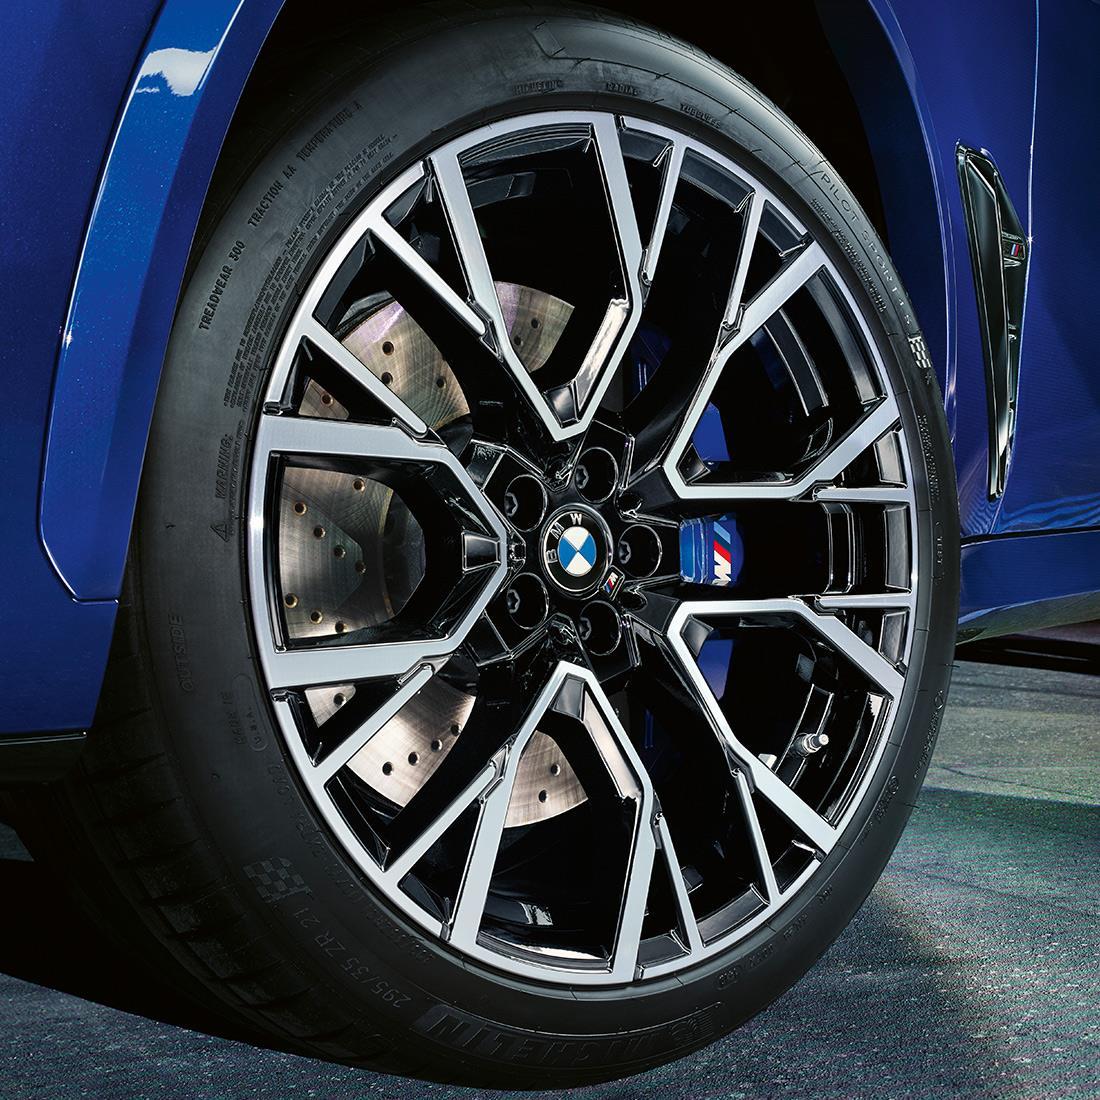 BMW M Performance Complete Wheel Set, Syte 809M in Jet Black Matt Finish